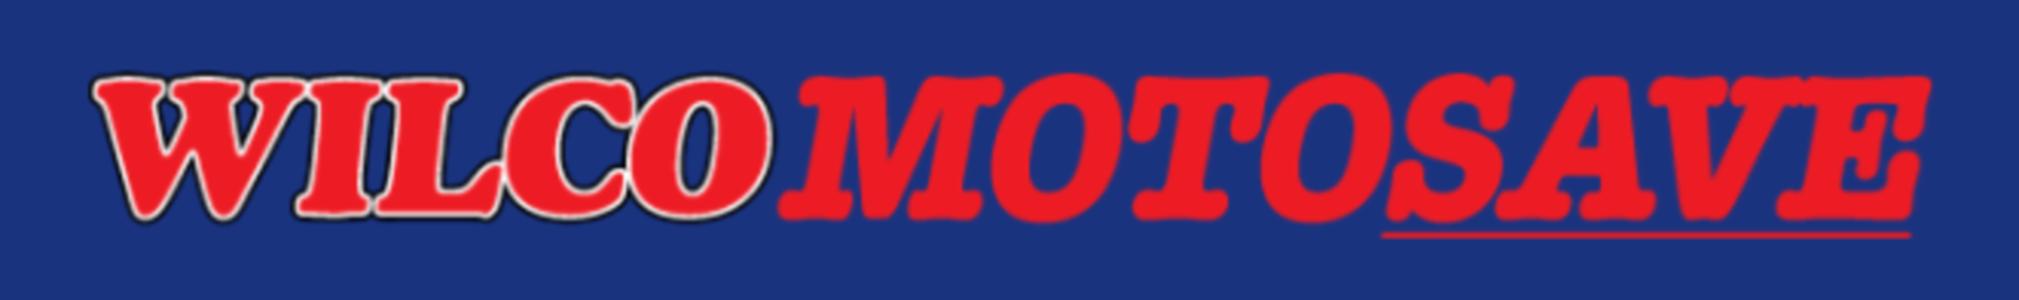 Wilco Motosave - Manchester